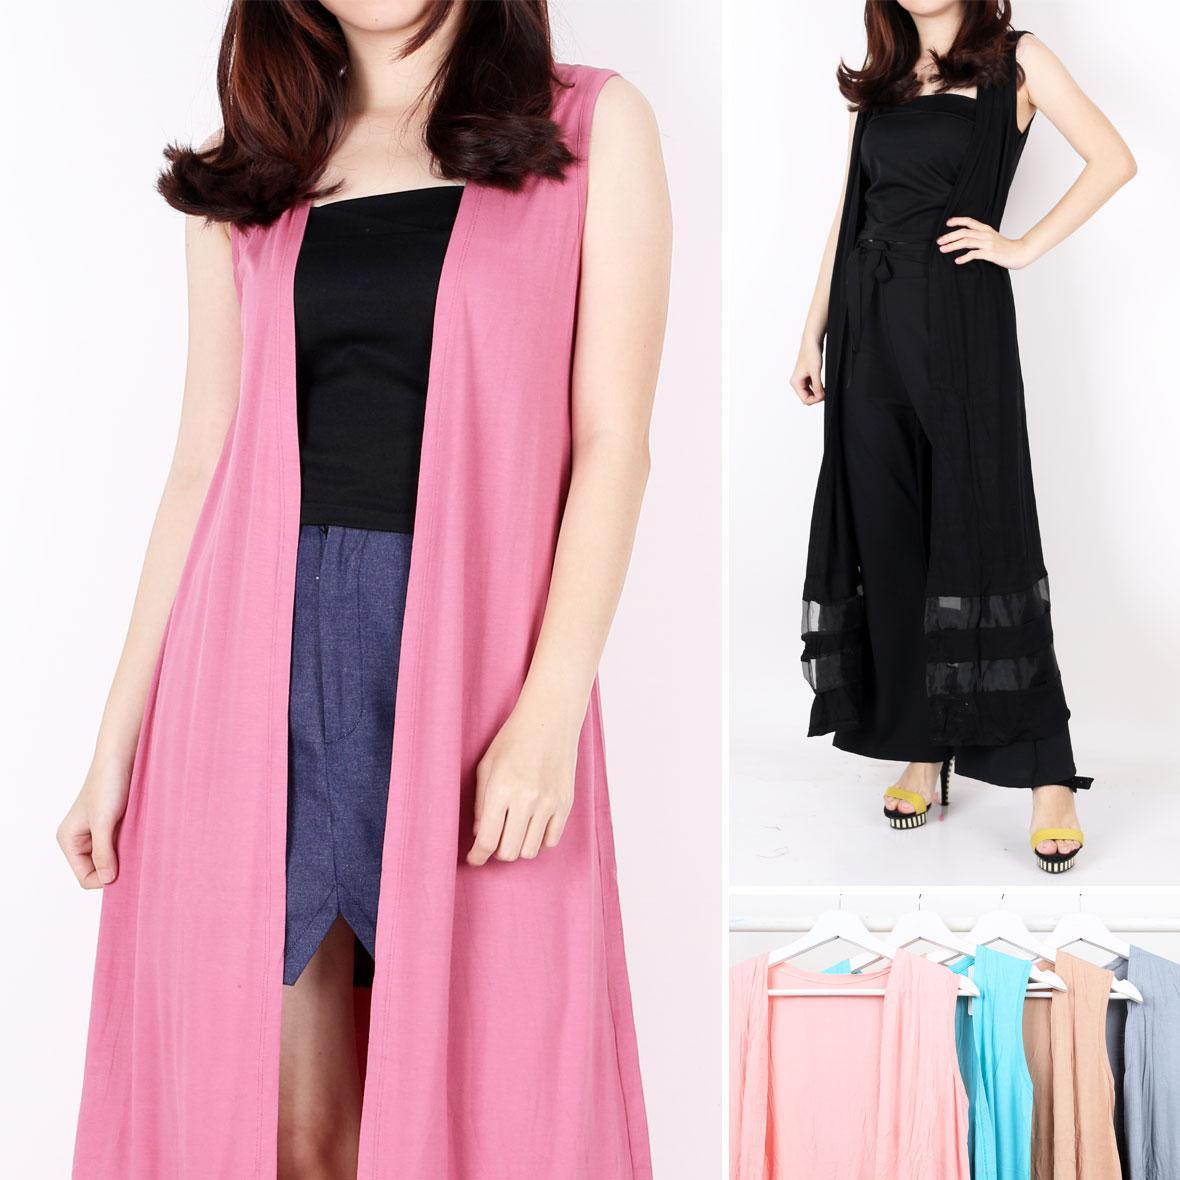 Oma Holley Fashion Casilda Long Cardigan Sleeveless 4 Warna-Size L